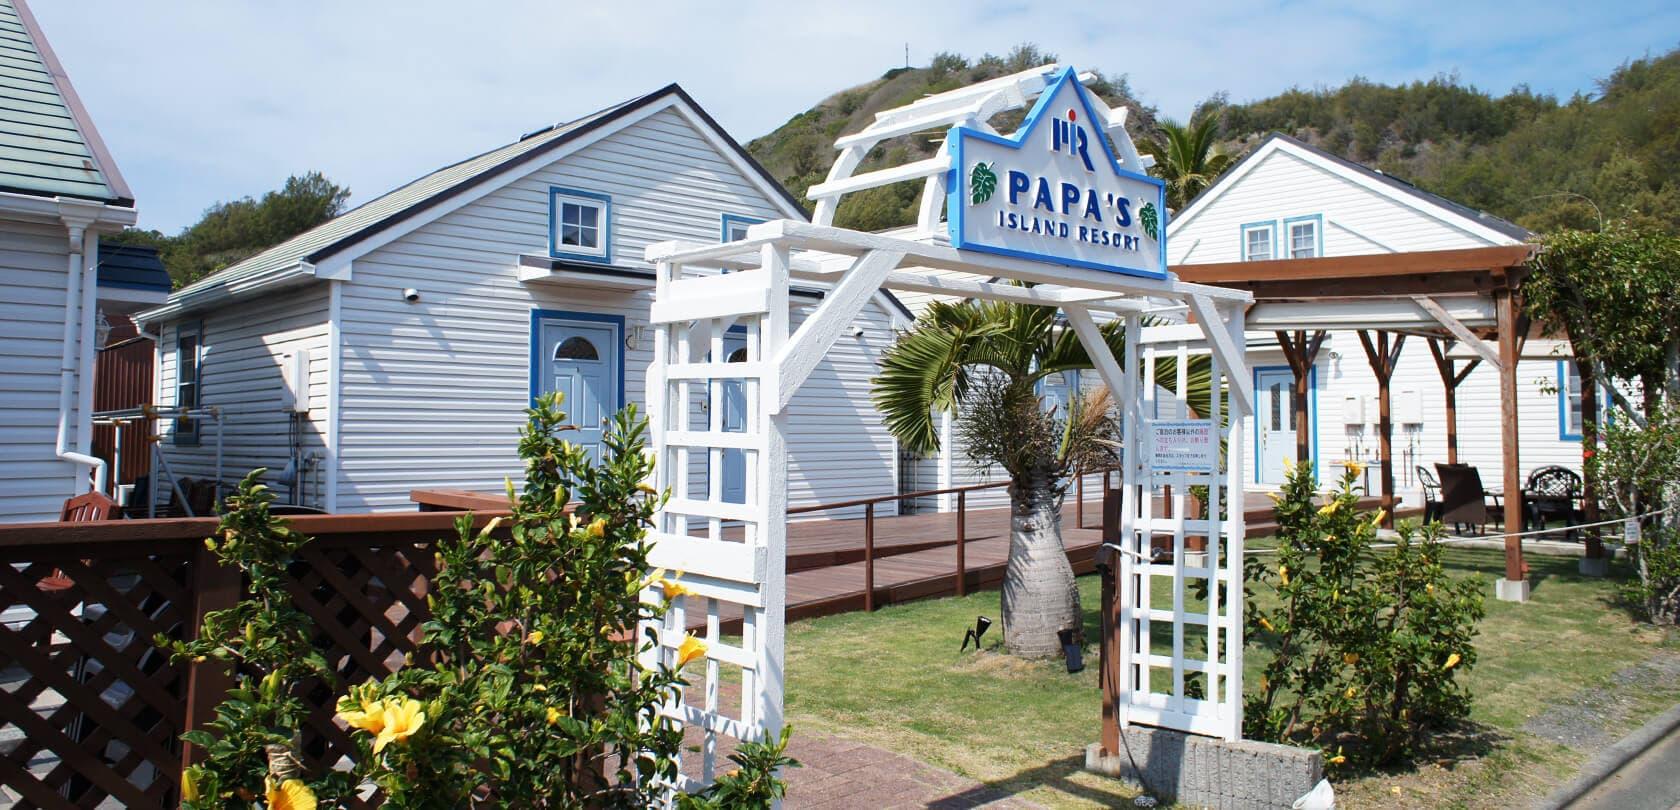 PAPA'S ISLAND RESORT